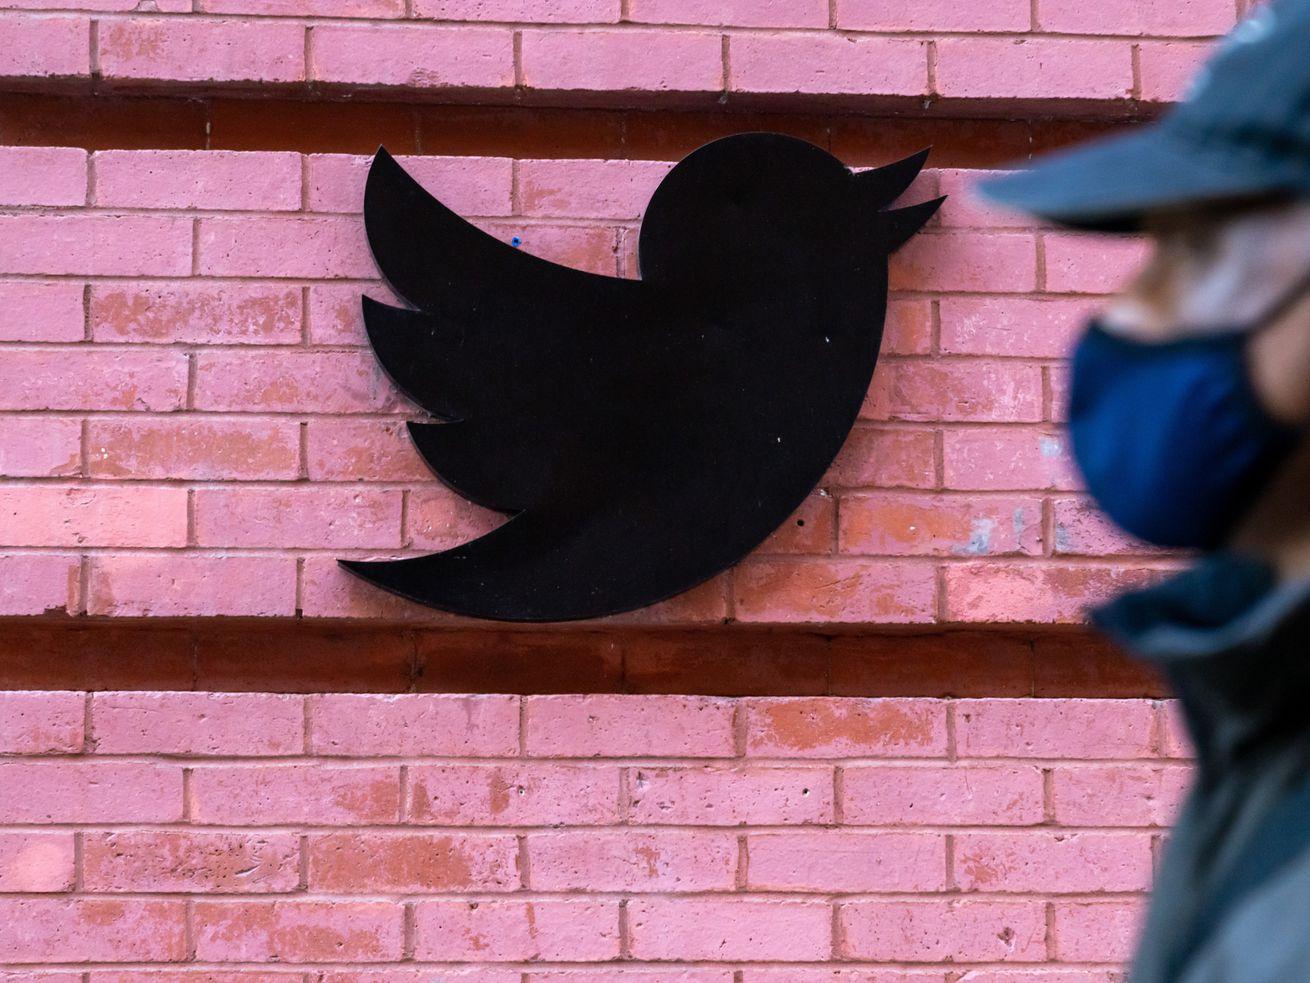 A man wearing a face mask walks past a Twitter logo outside.